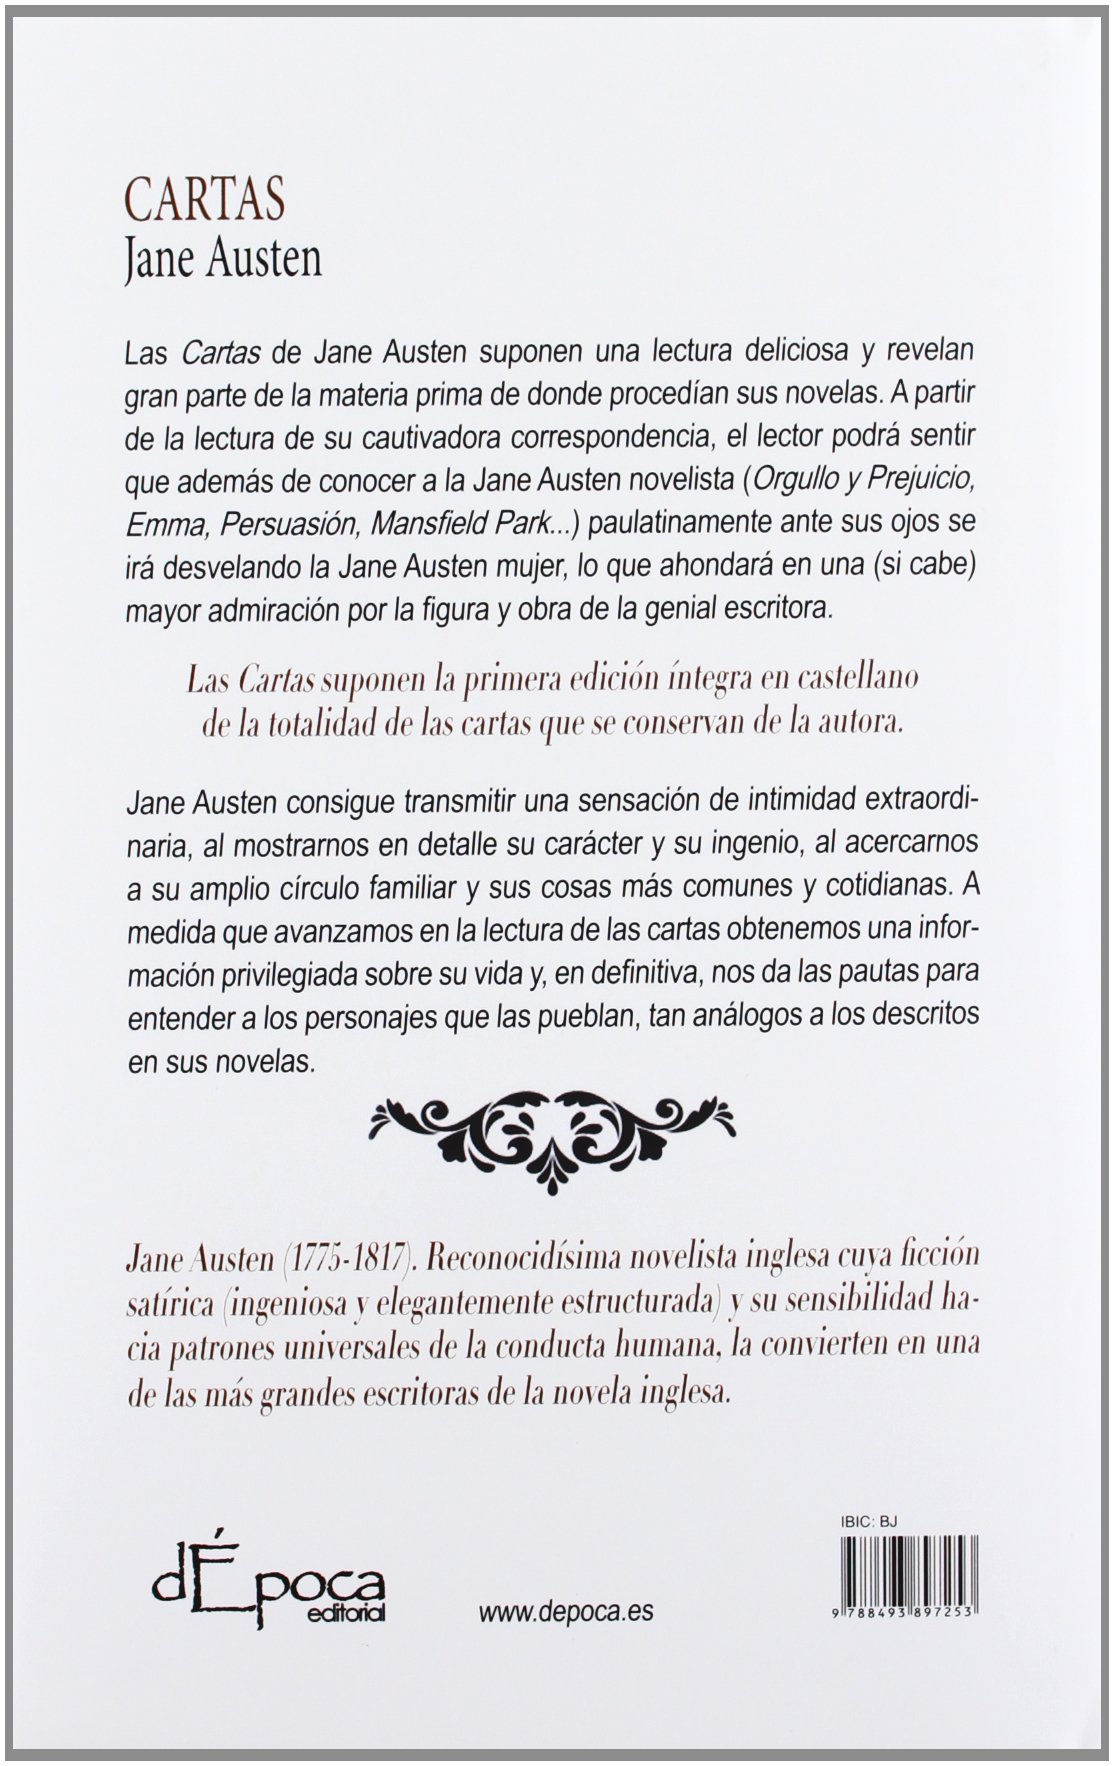 Cartas (Lettere De Epoca (depoca)): Amazon.es: Jane Austen ...